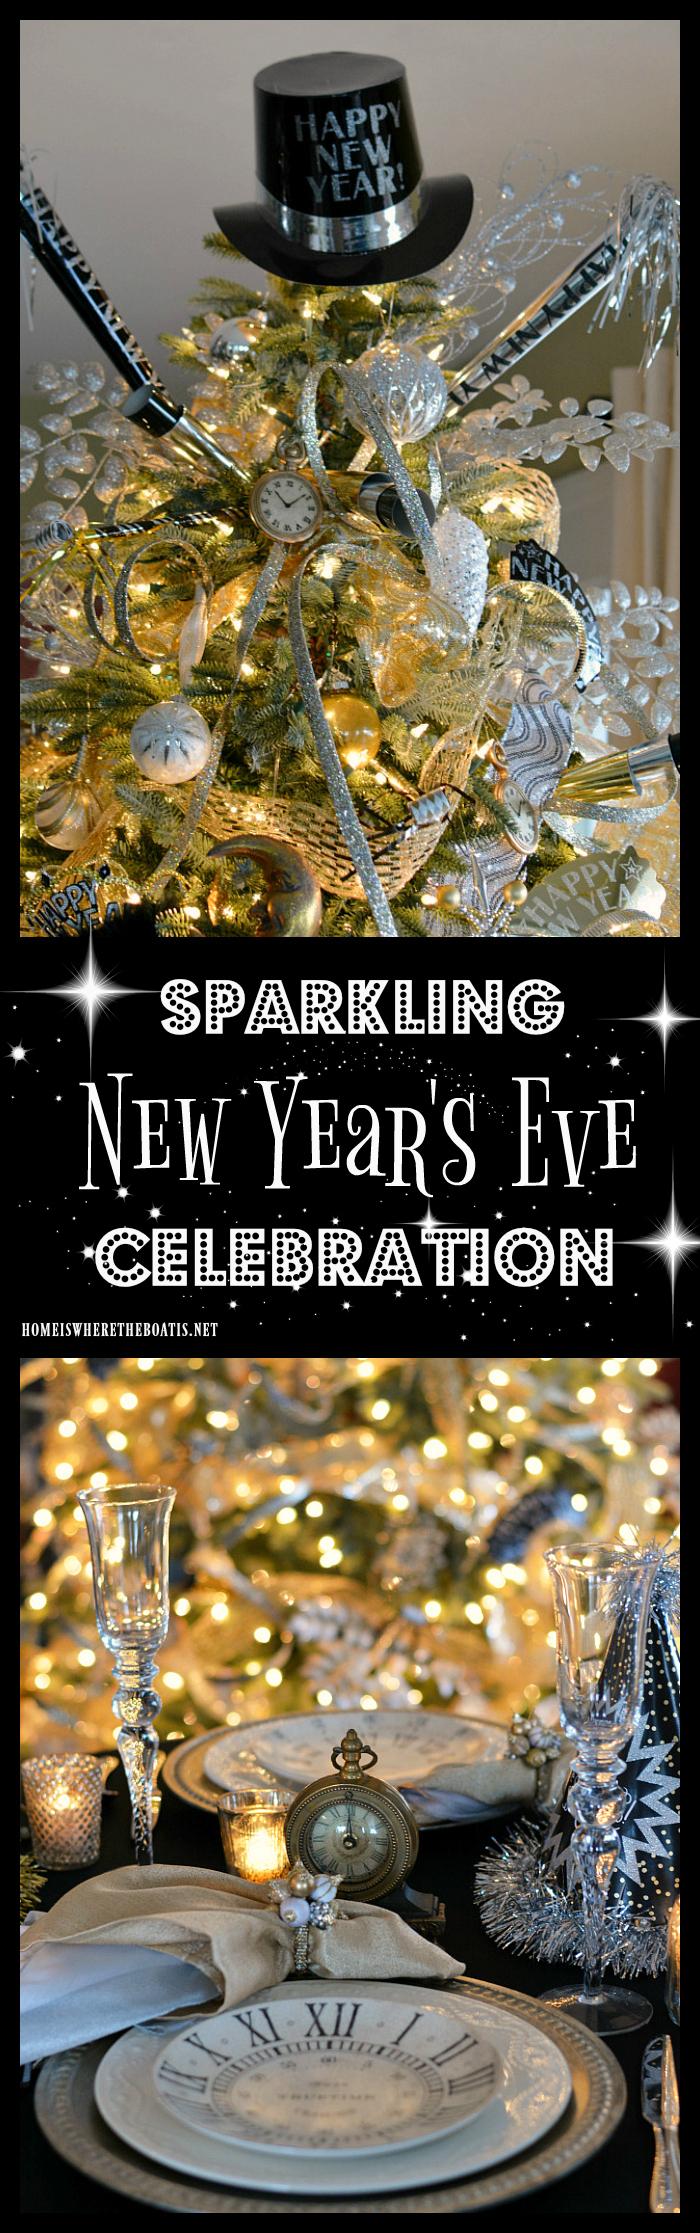 sparkling-new-years-eve-celebration